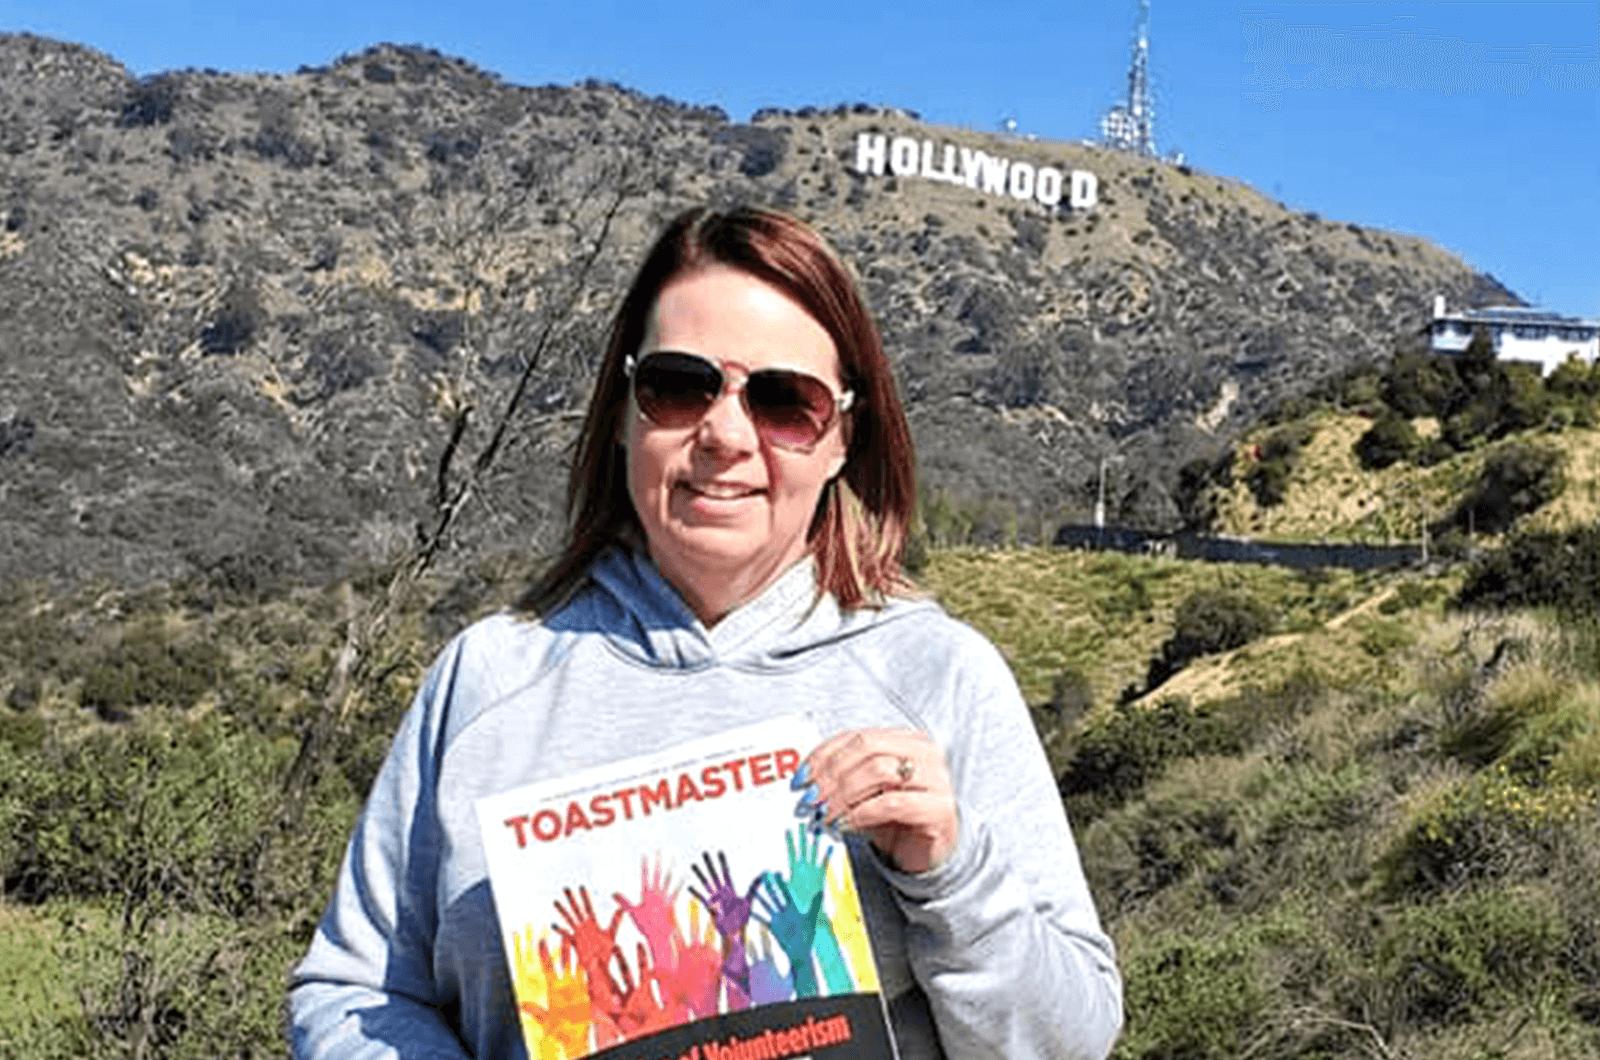 Billie Sutherland, DTM, of Fargo, North Dakota, visits the Hollywood sign in Los Angeles, California.